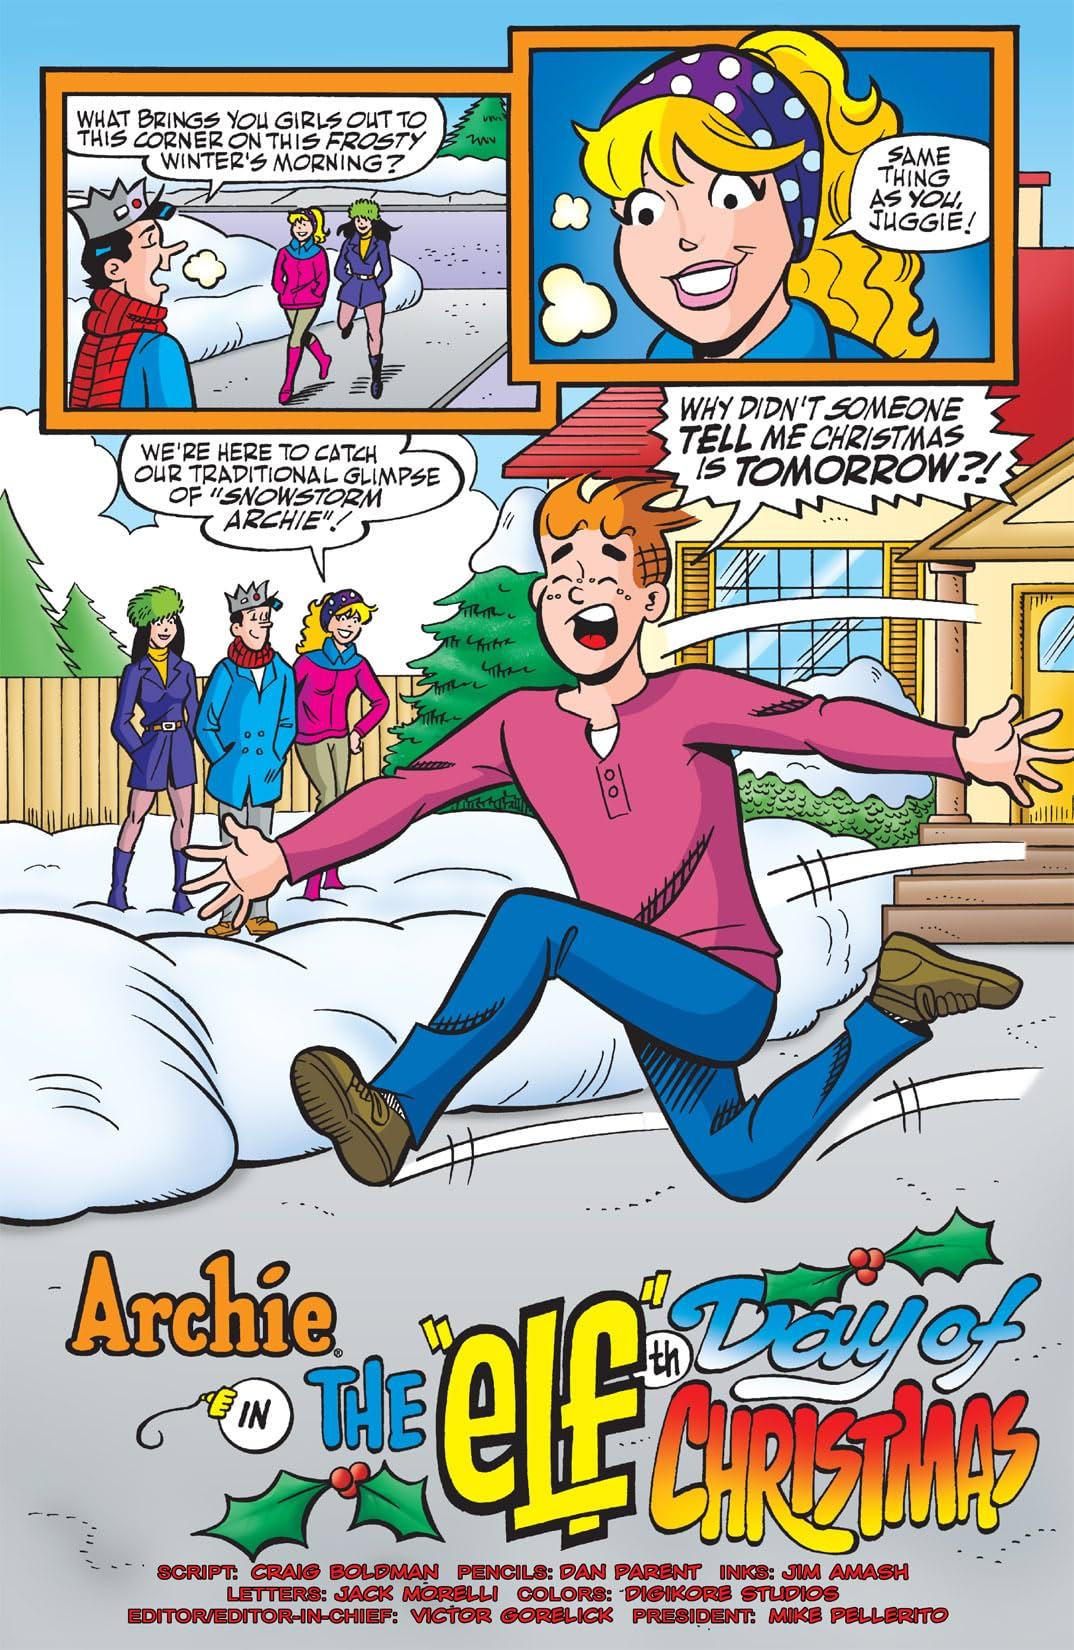 Archie #615